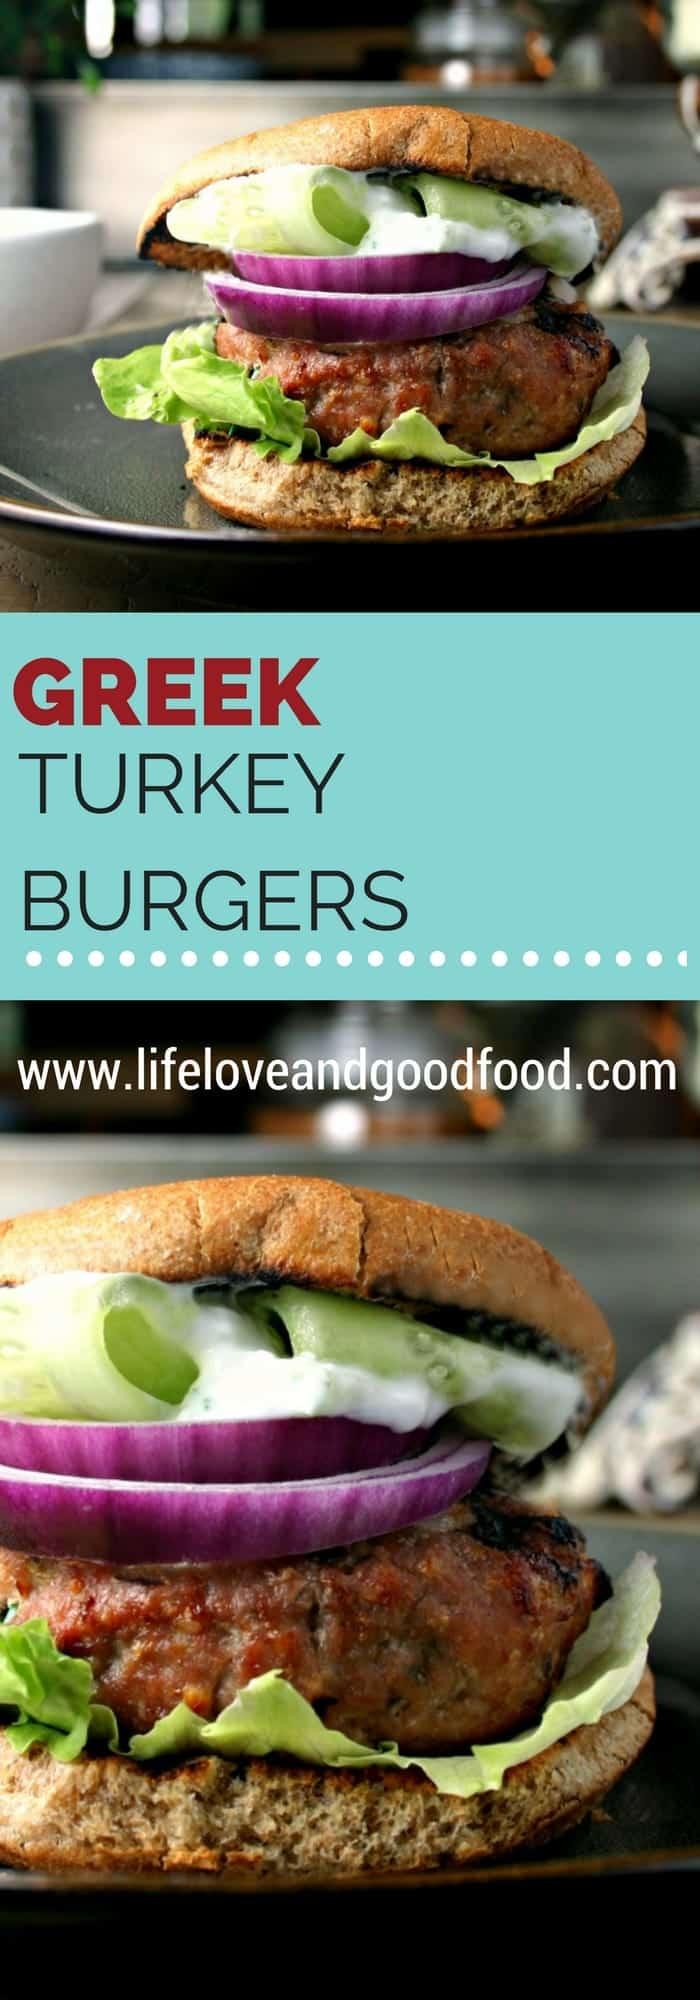 Greek Turkey Burgers | www.lifeloveandgoodfood.com